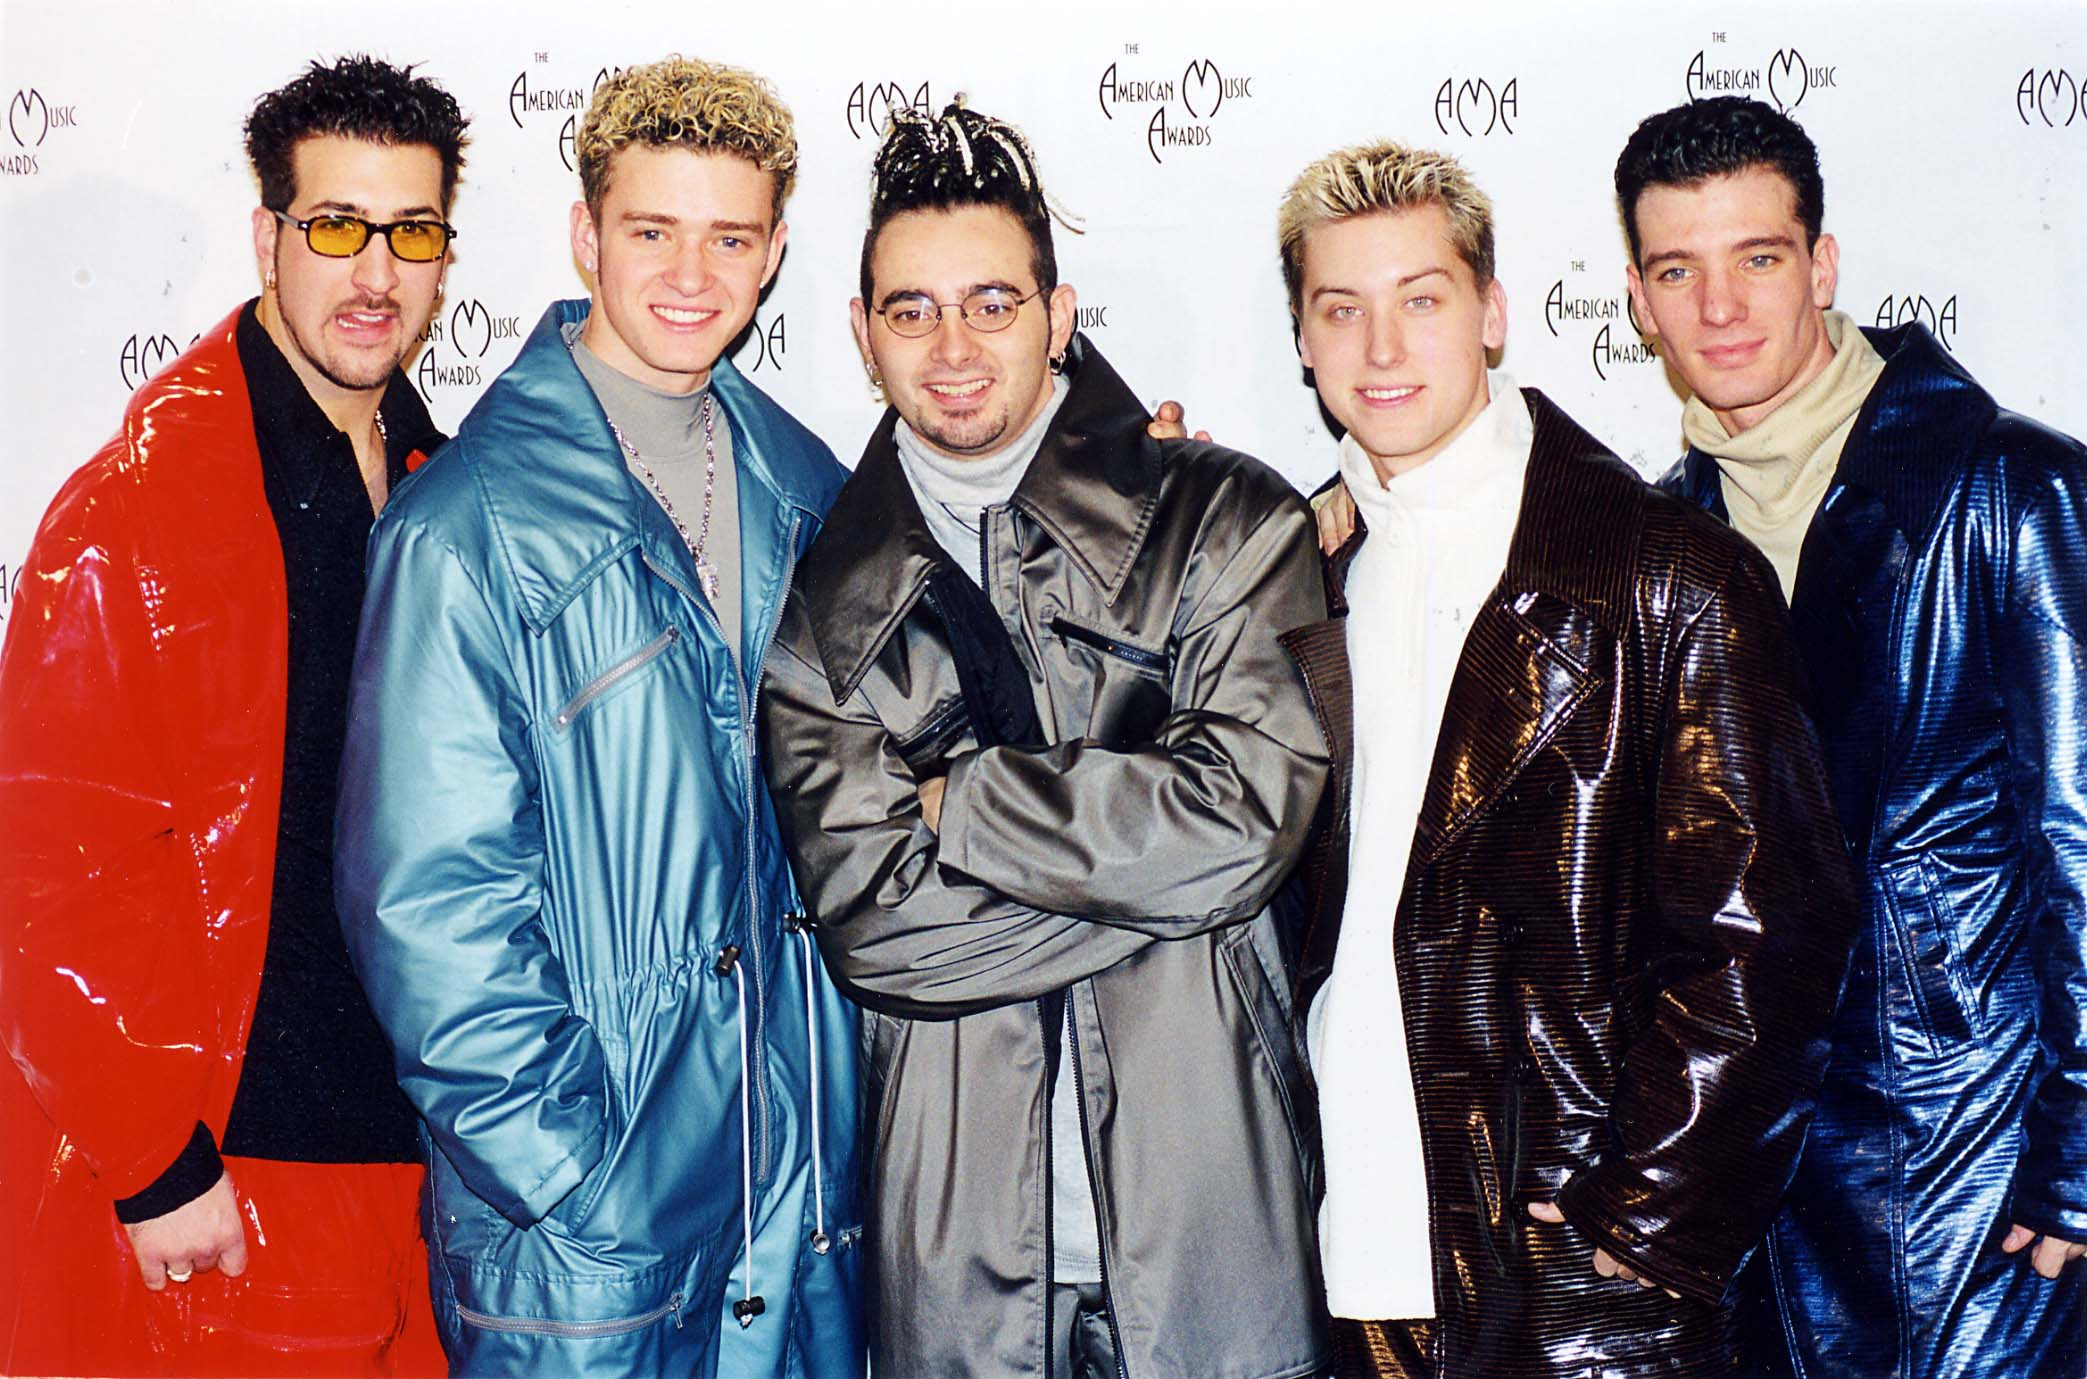 Joey Fatone, Justin Timberlake, Chris Kirkpatrick, Lance Bass y JC Chasez